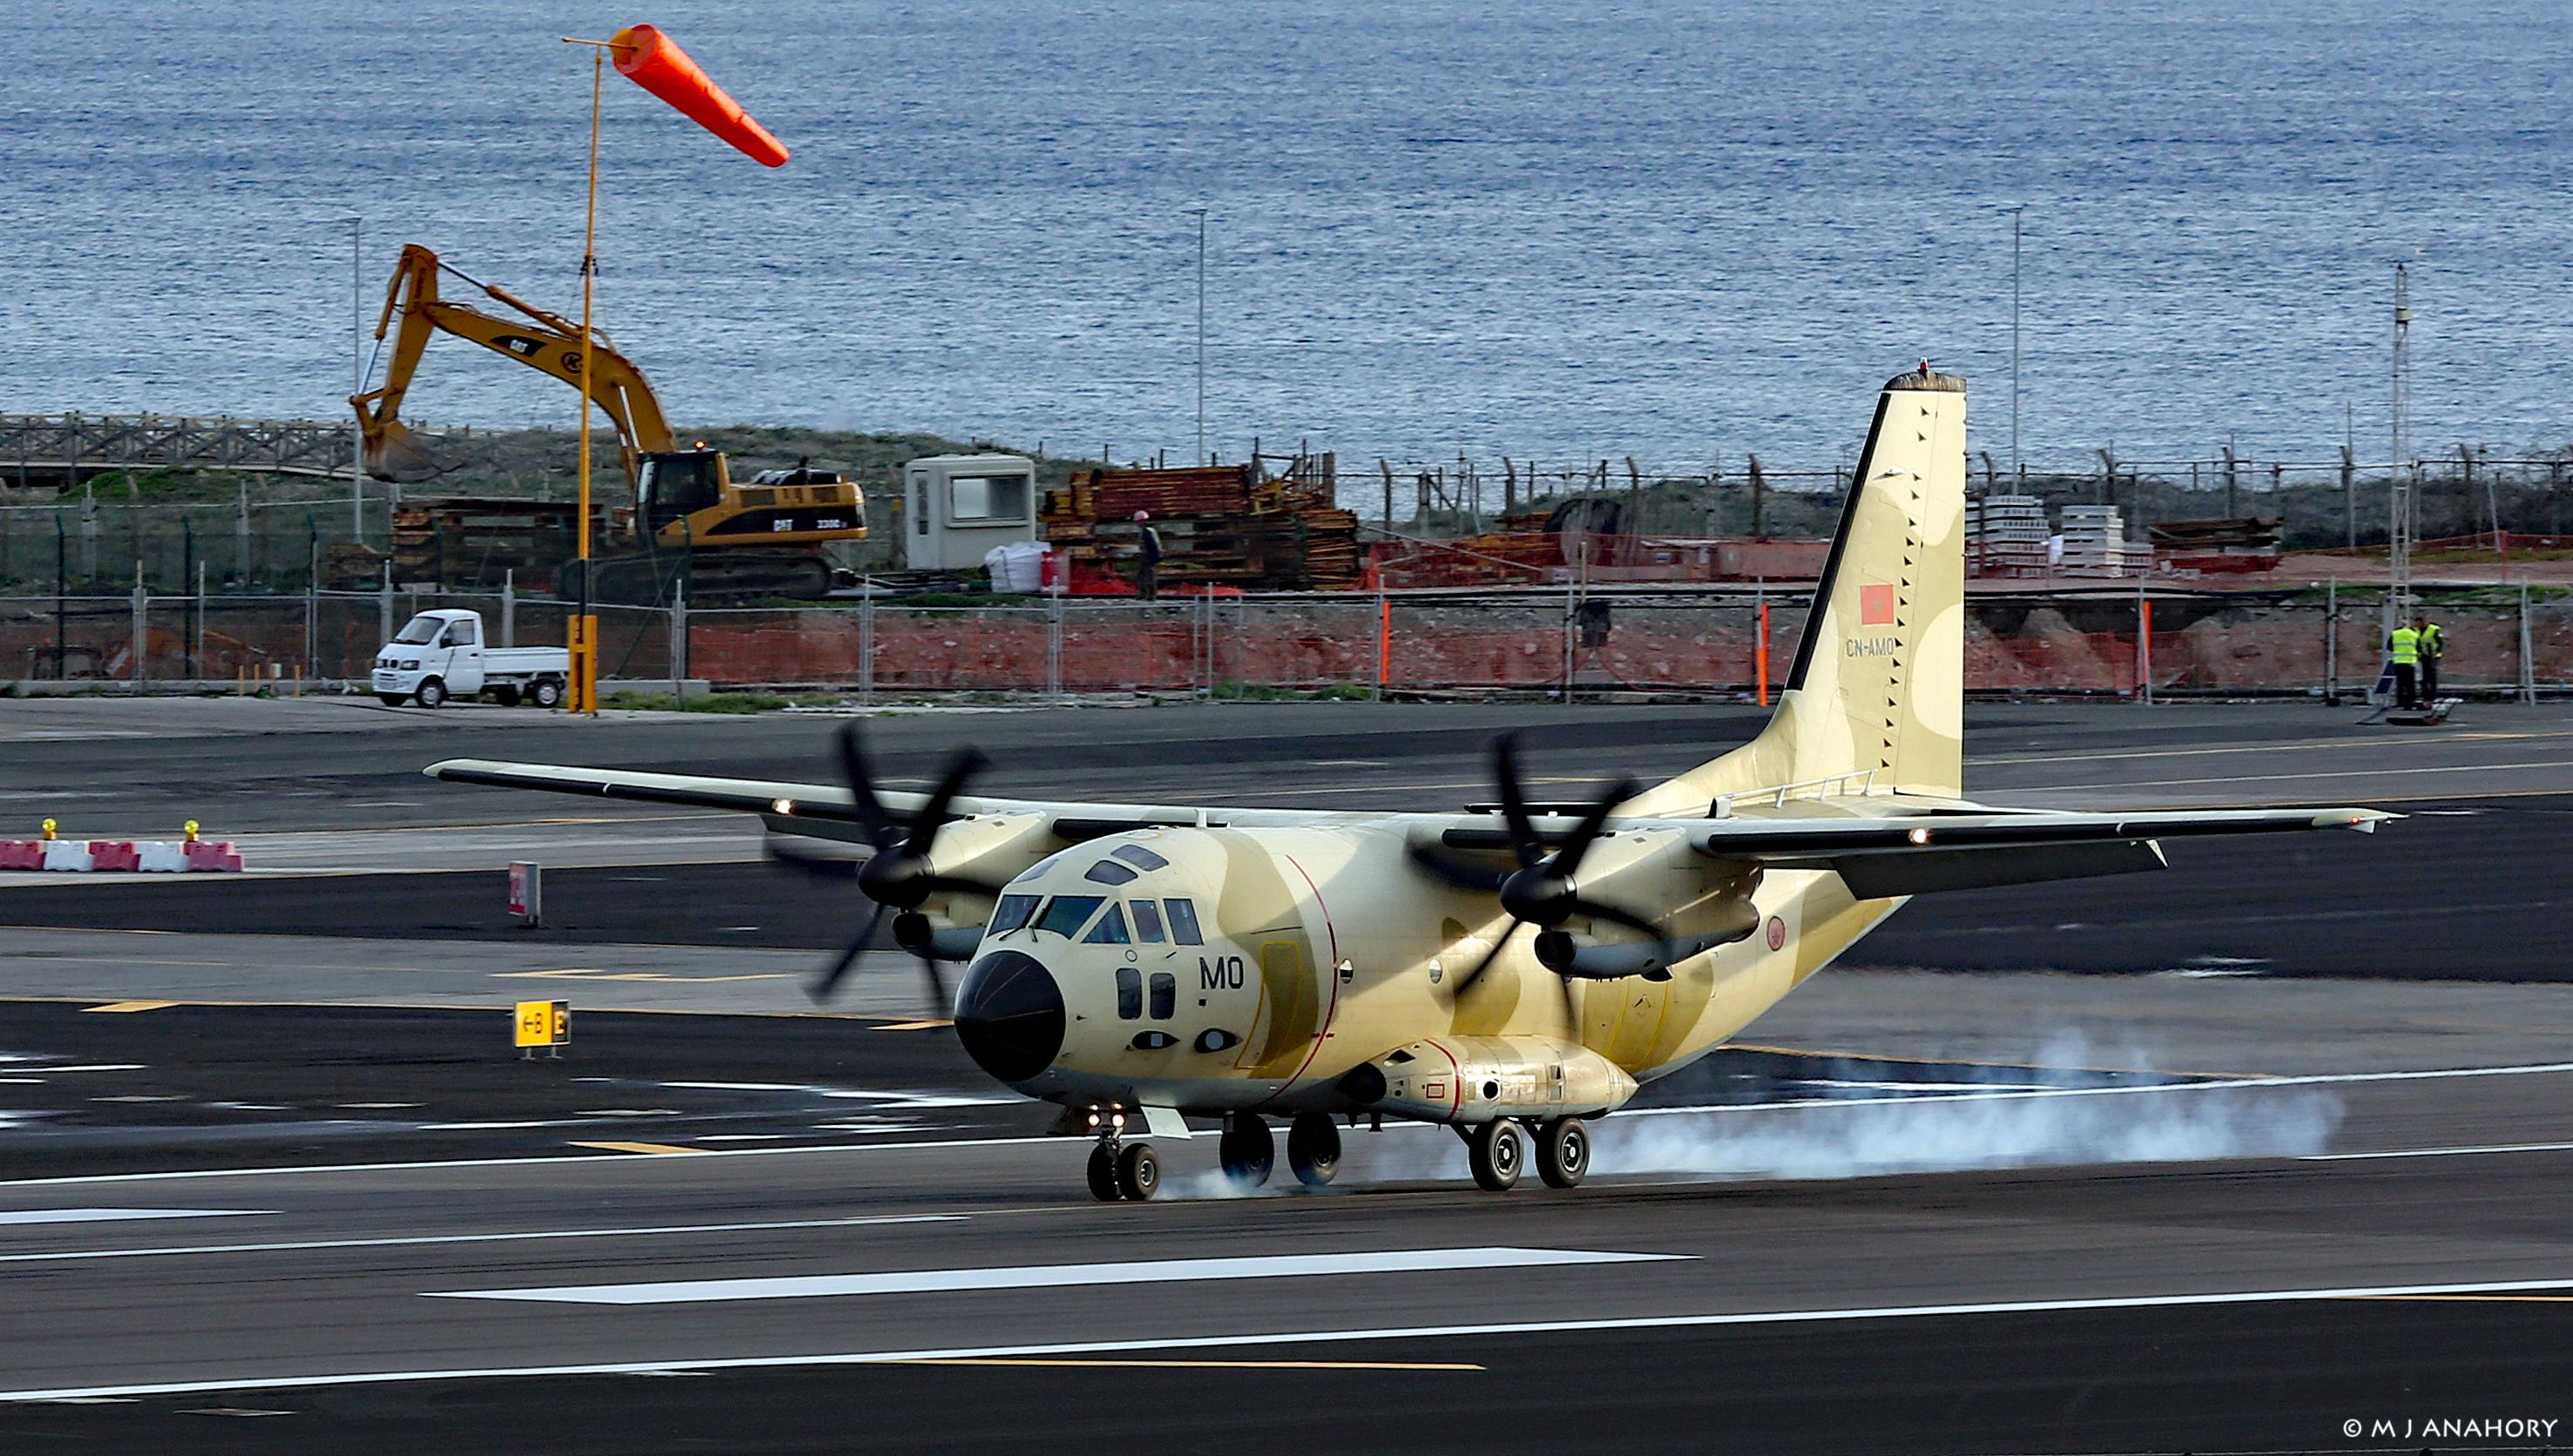 FRA: Photos d'avions de transport - Page 25 24979142315_4ffaa07d3f_o